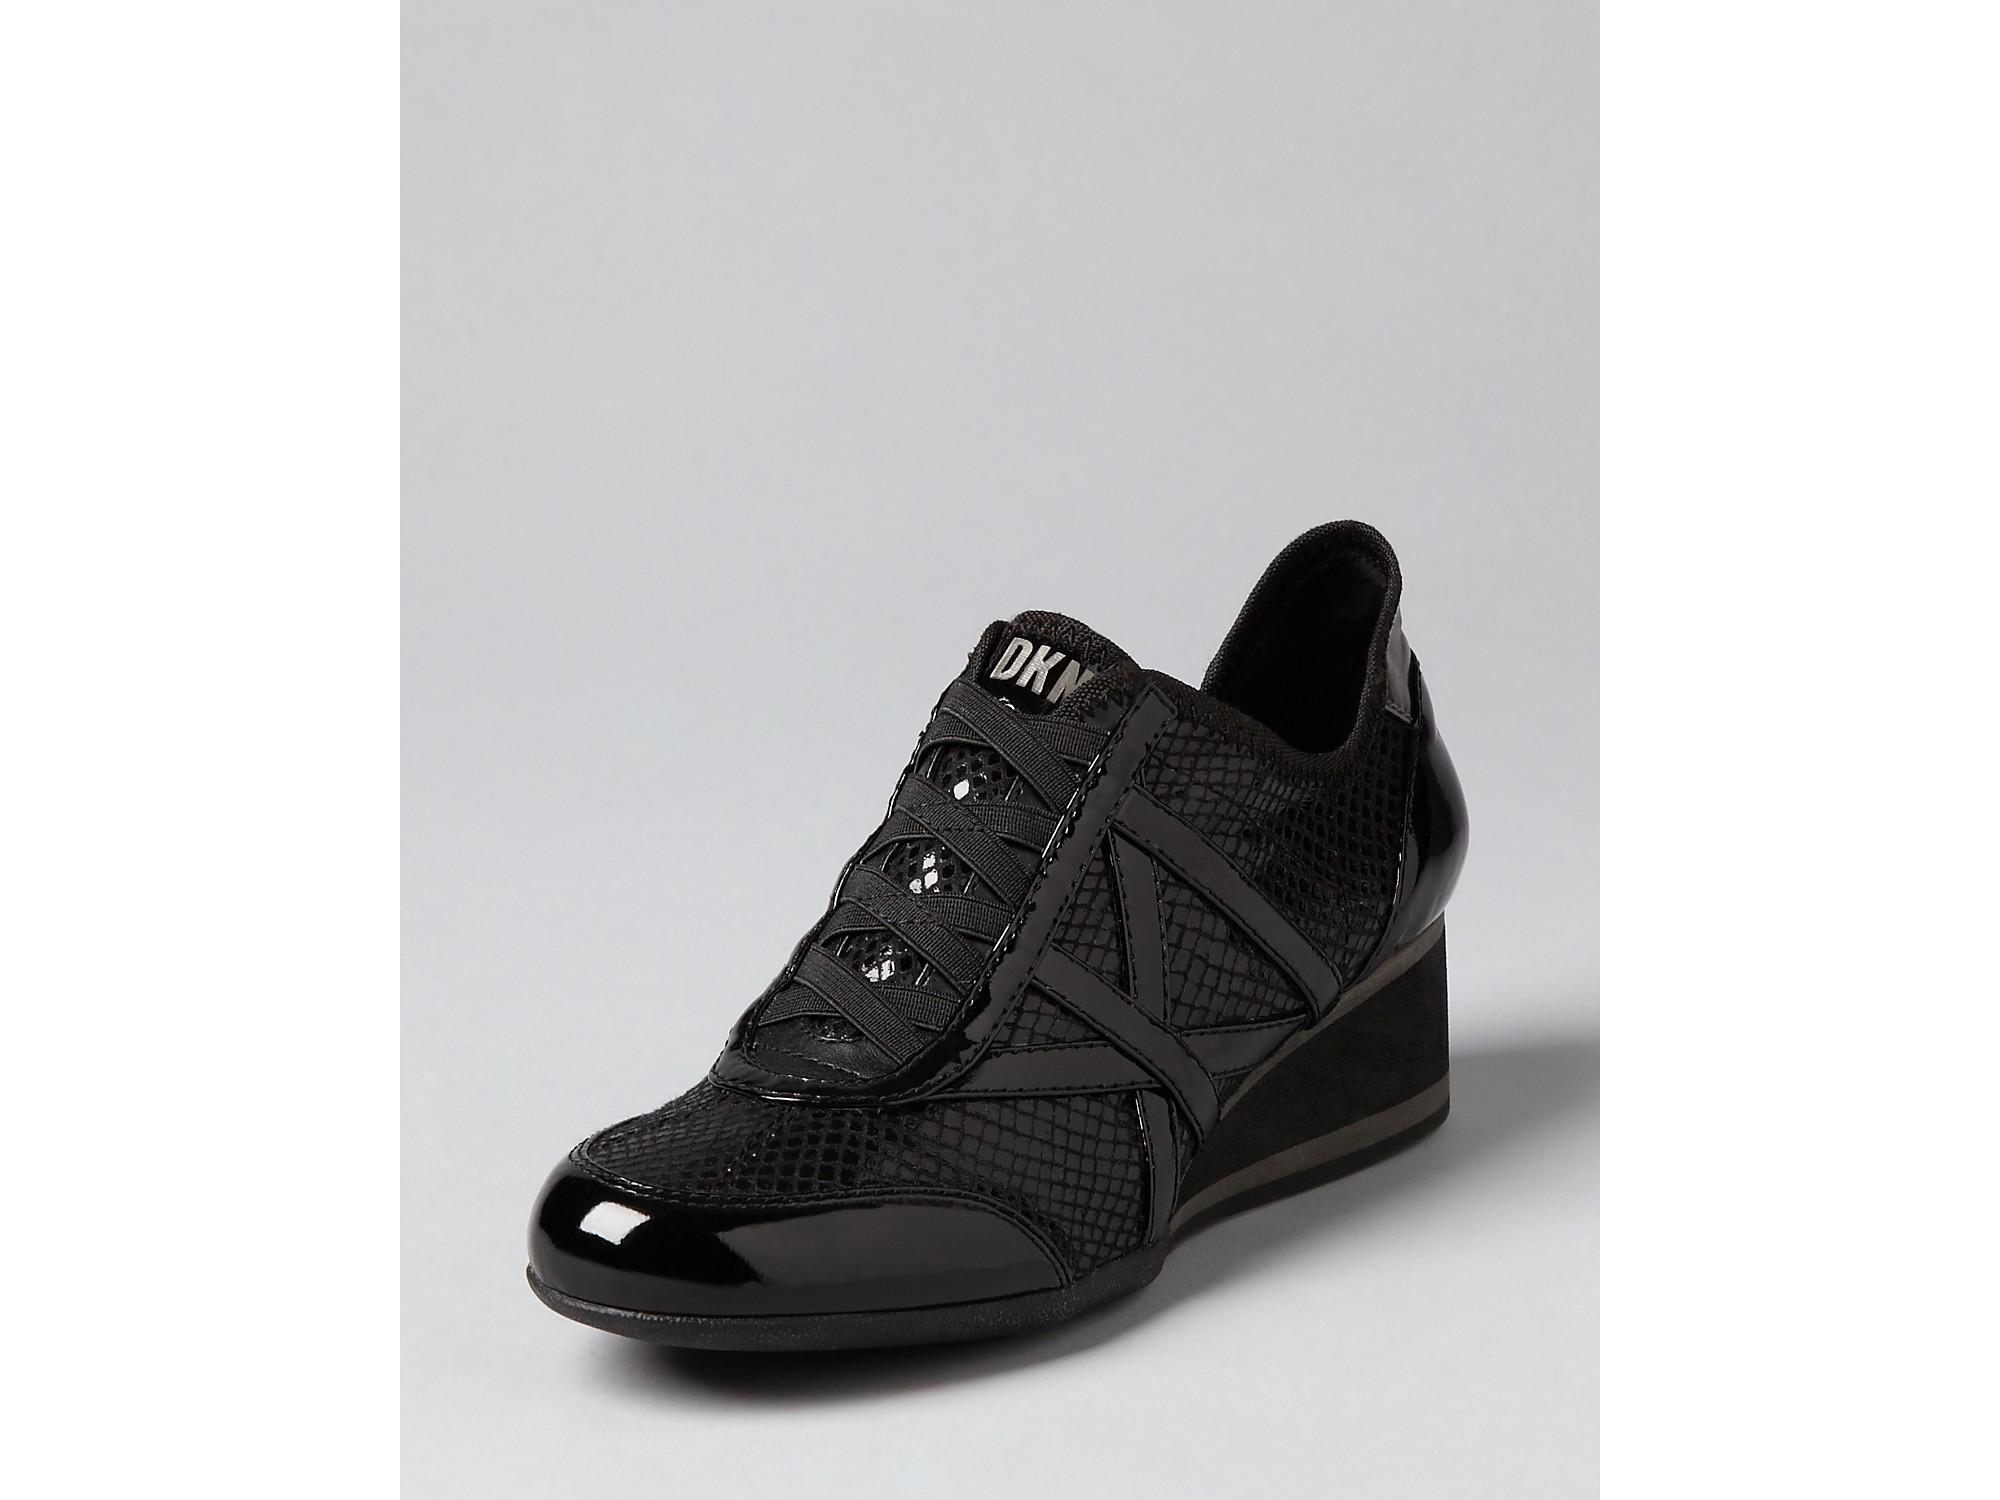 Dkny Lace Up Sneakers Regina In Black Lyst